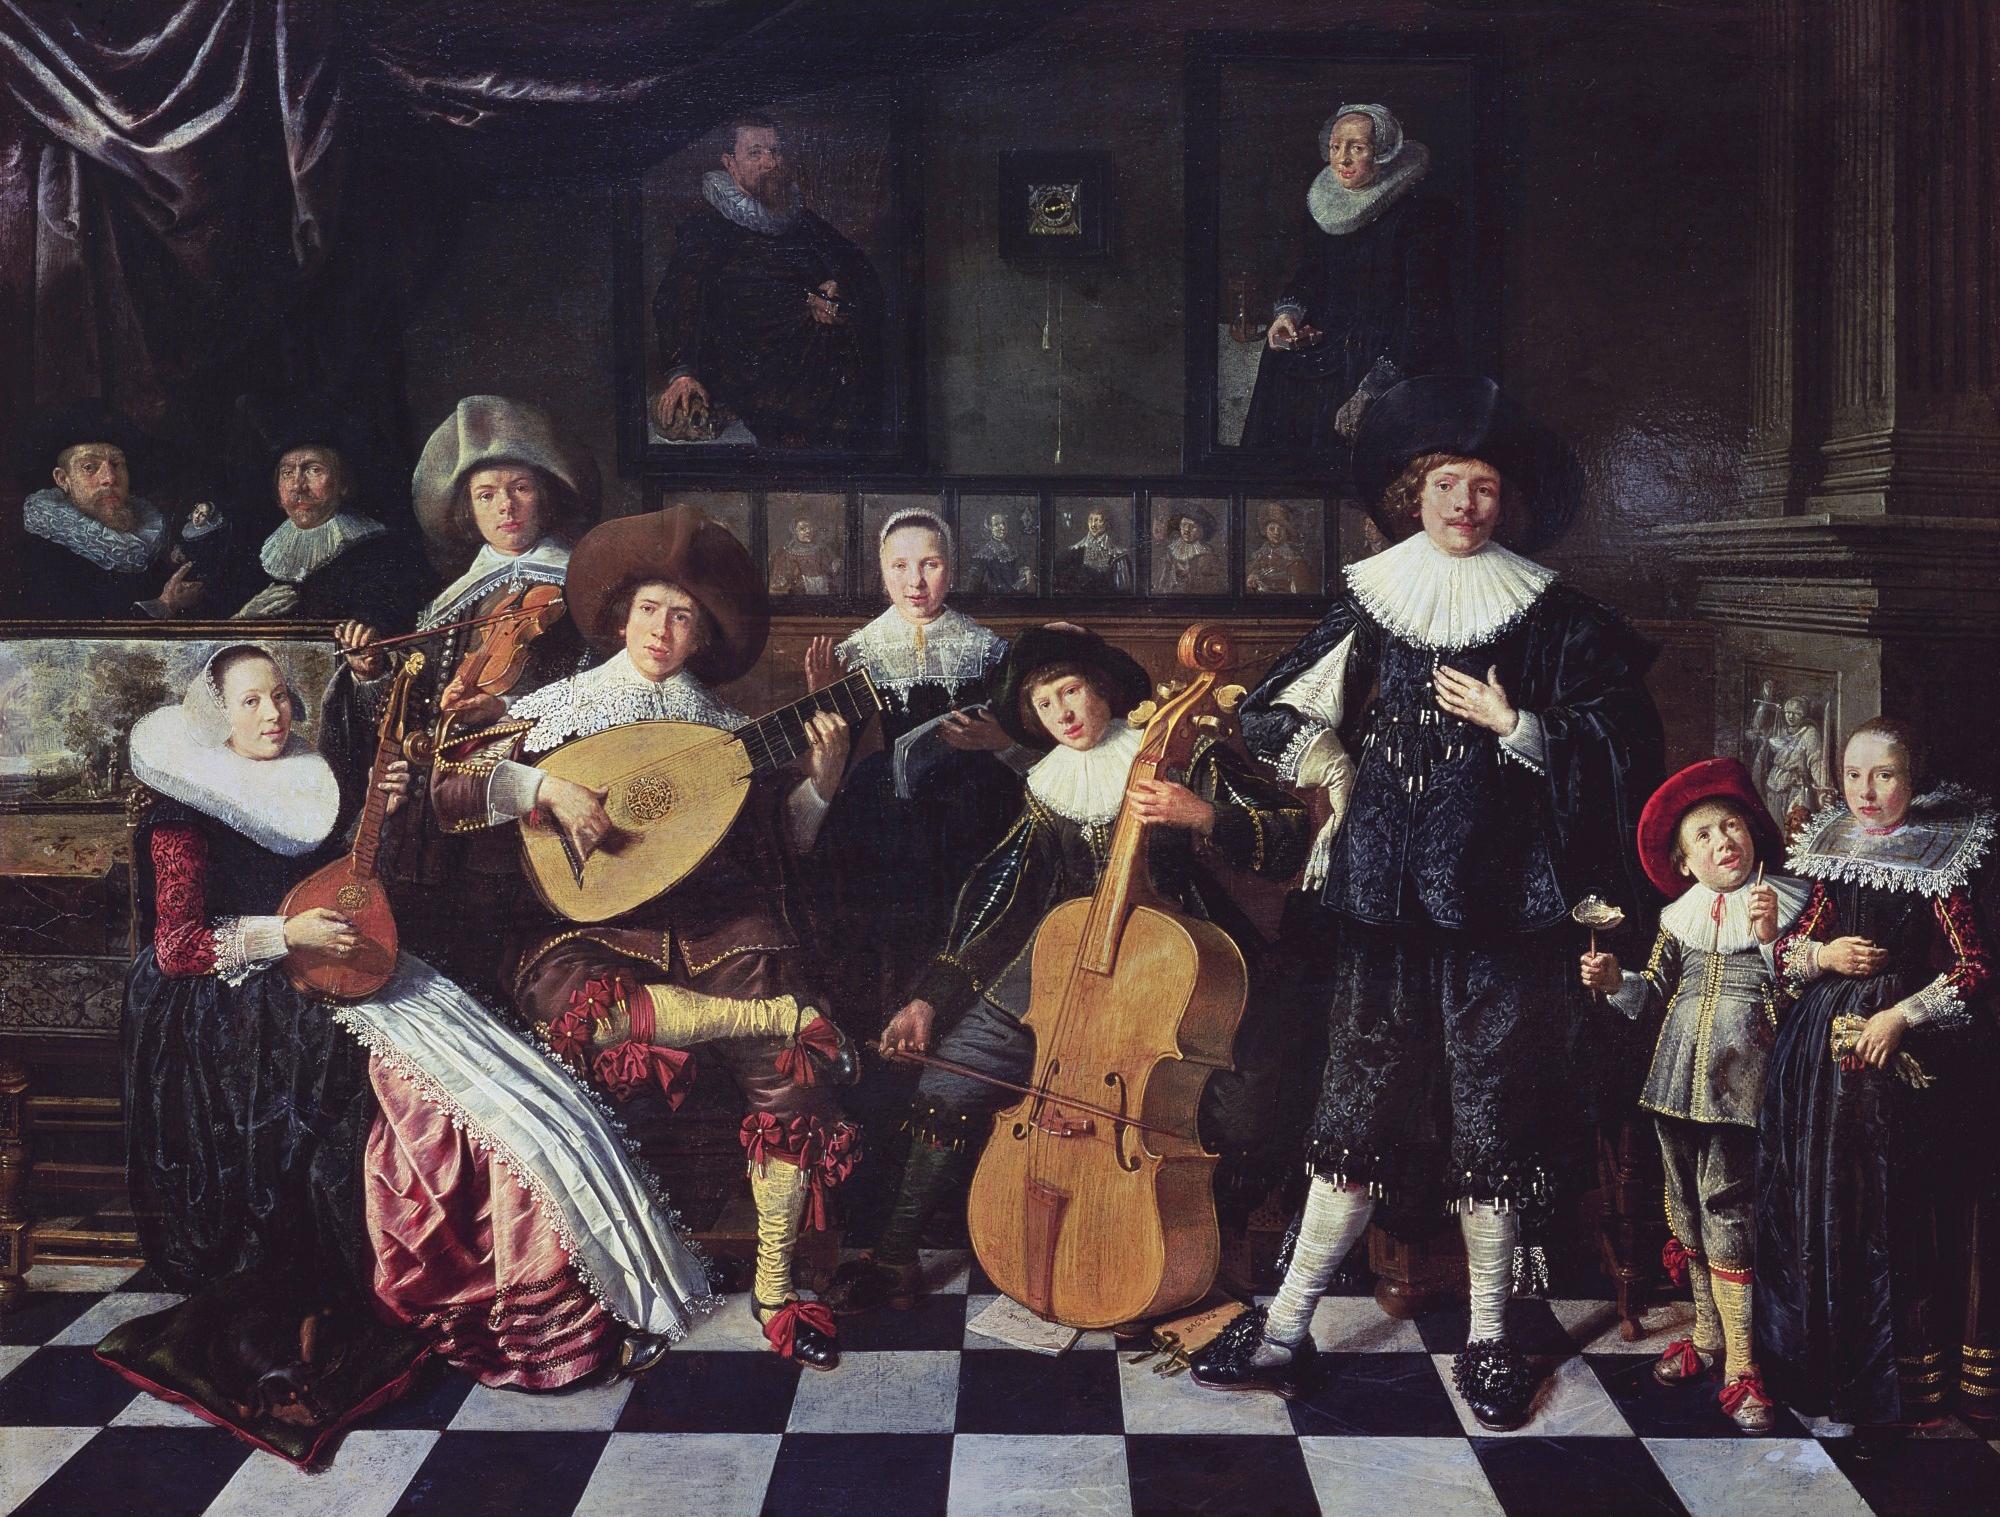 Картинки с музыкальной культуры